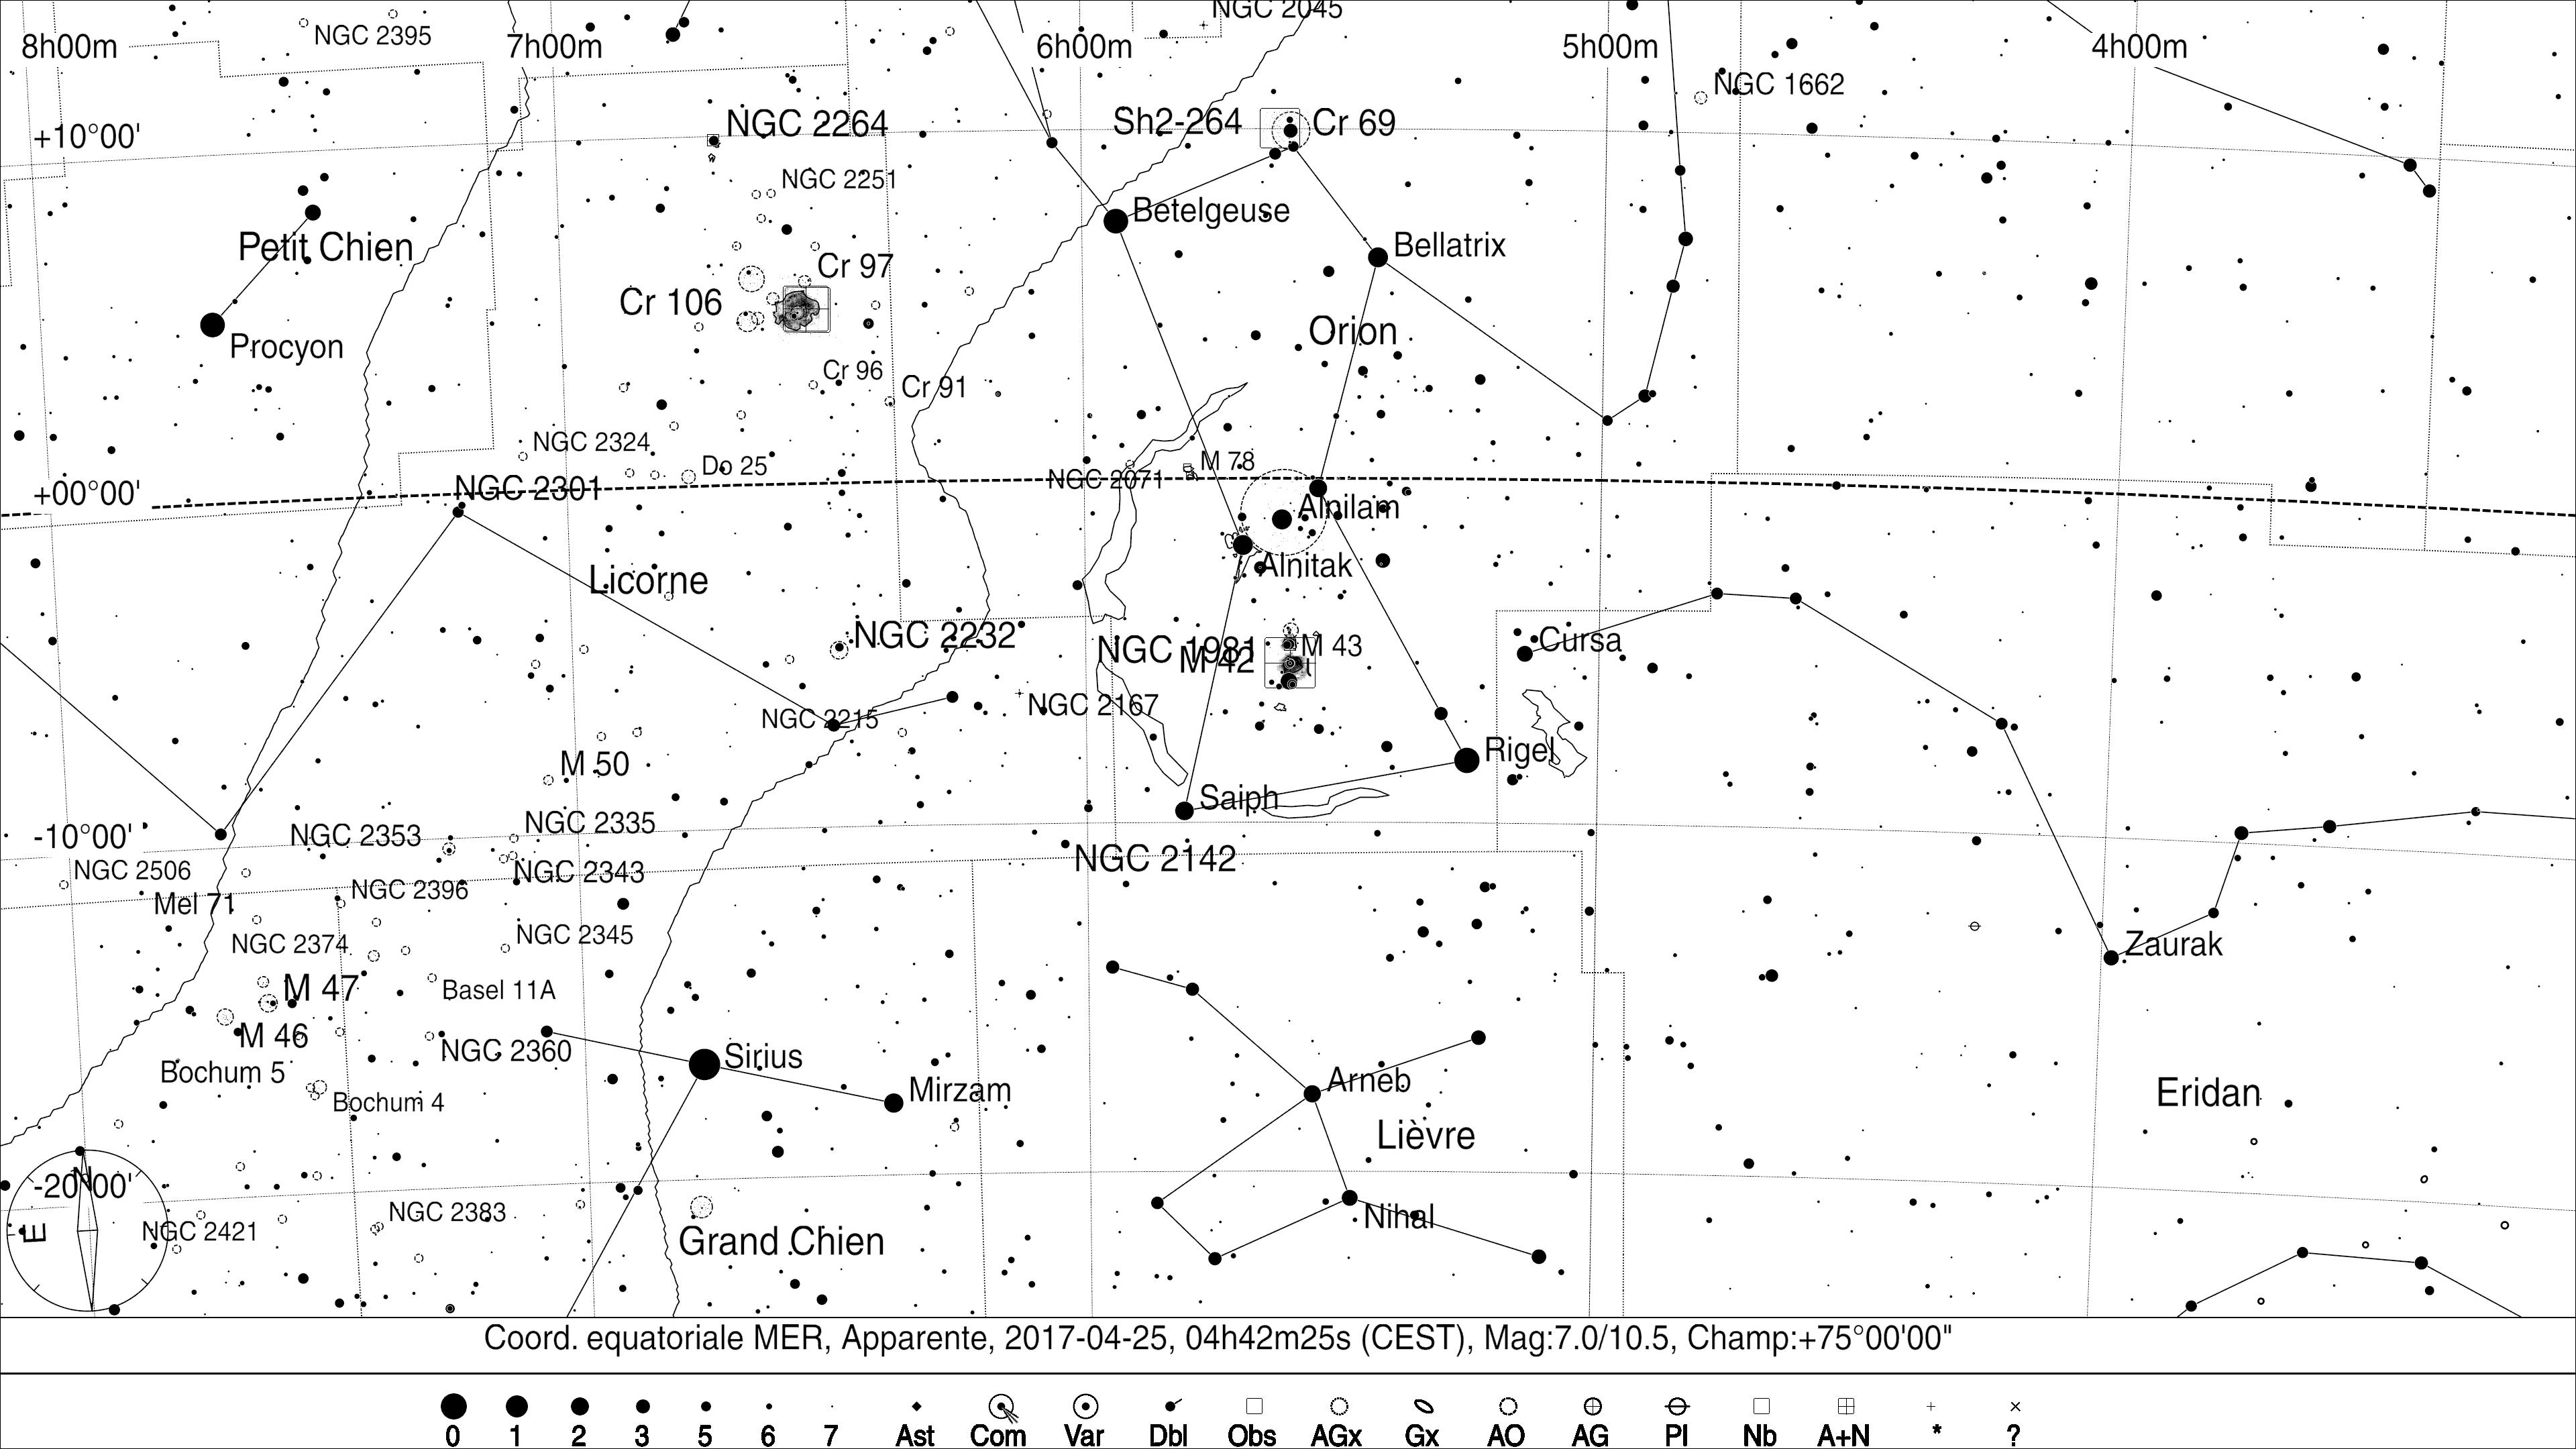 M43_75